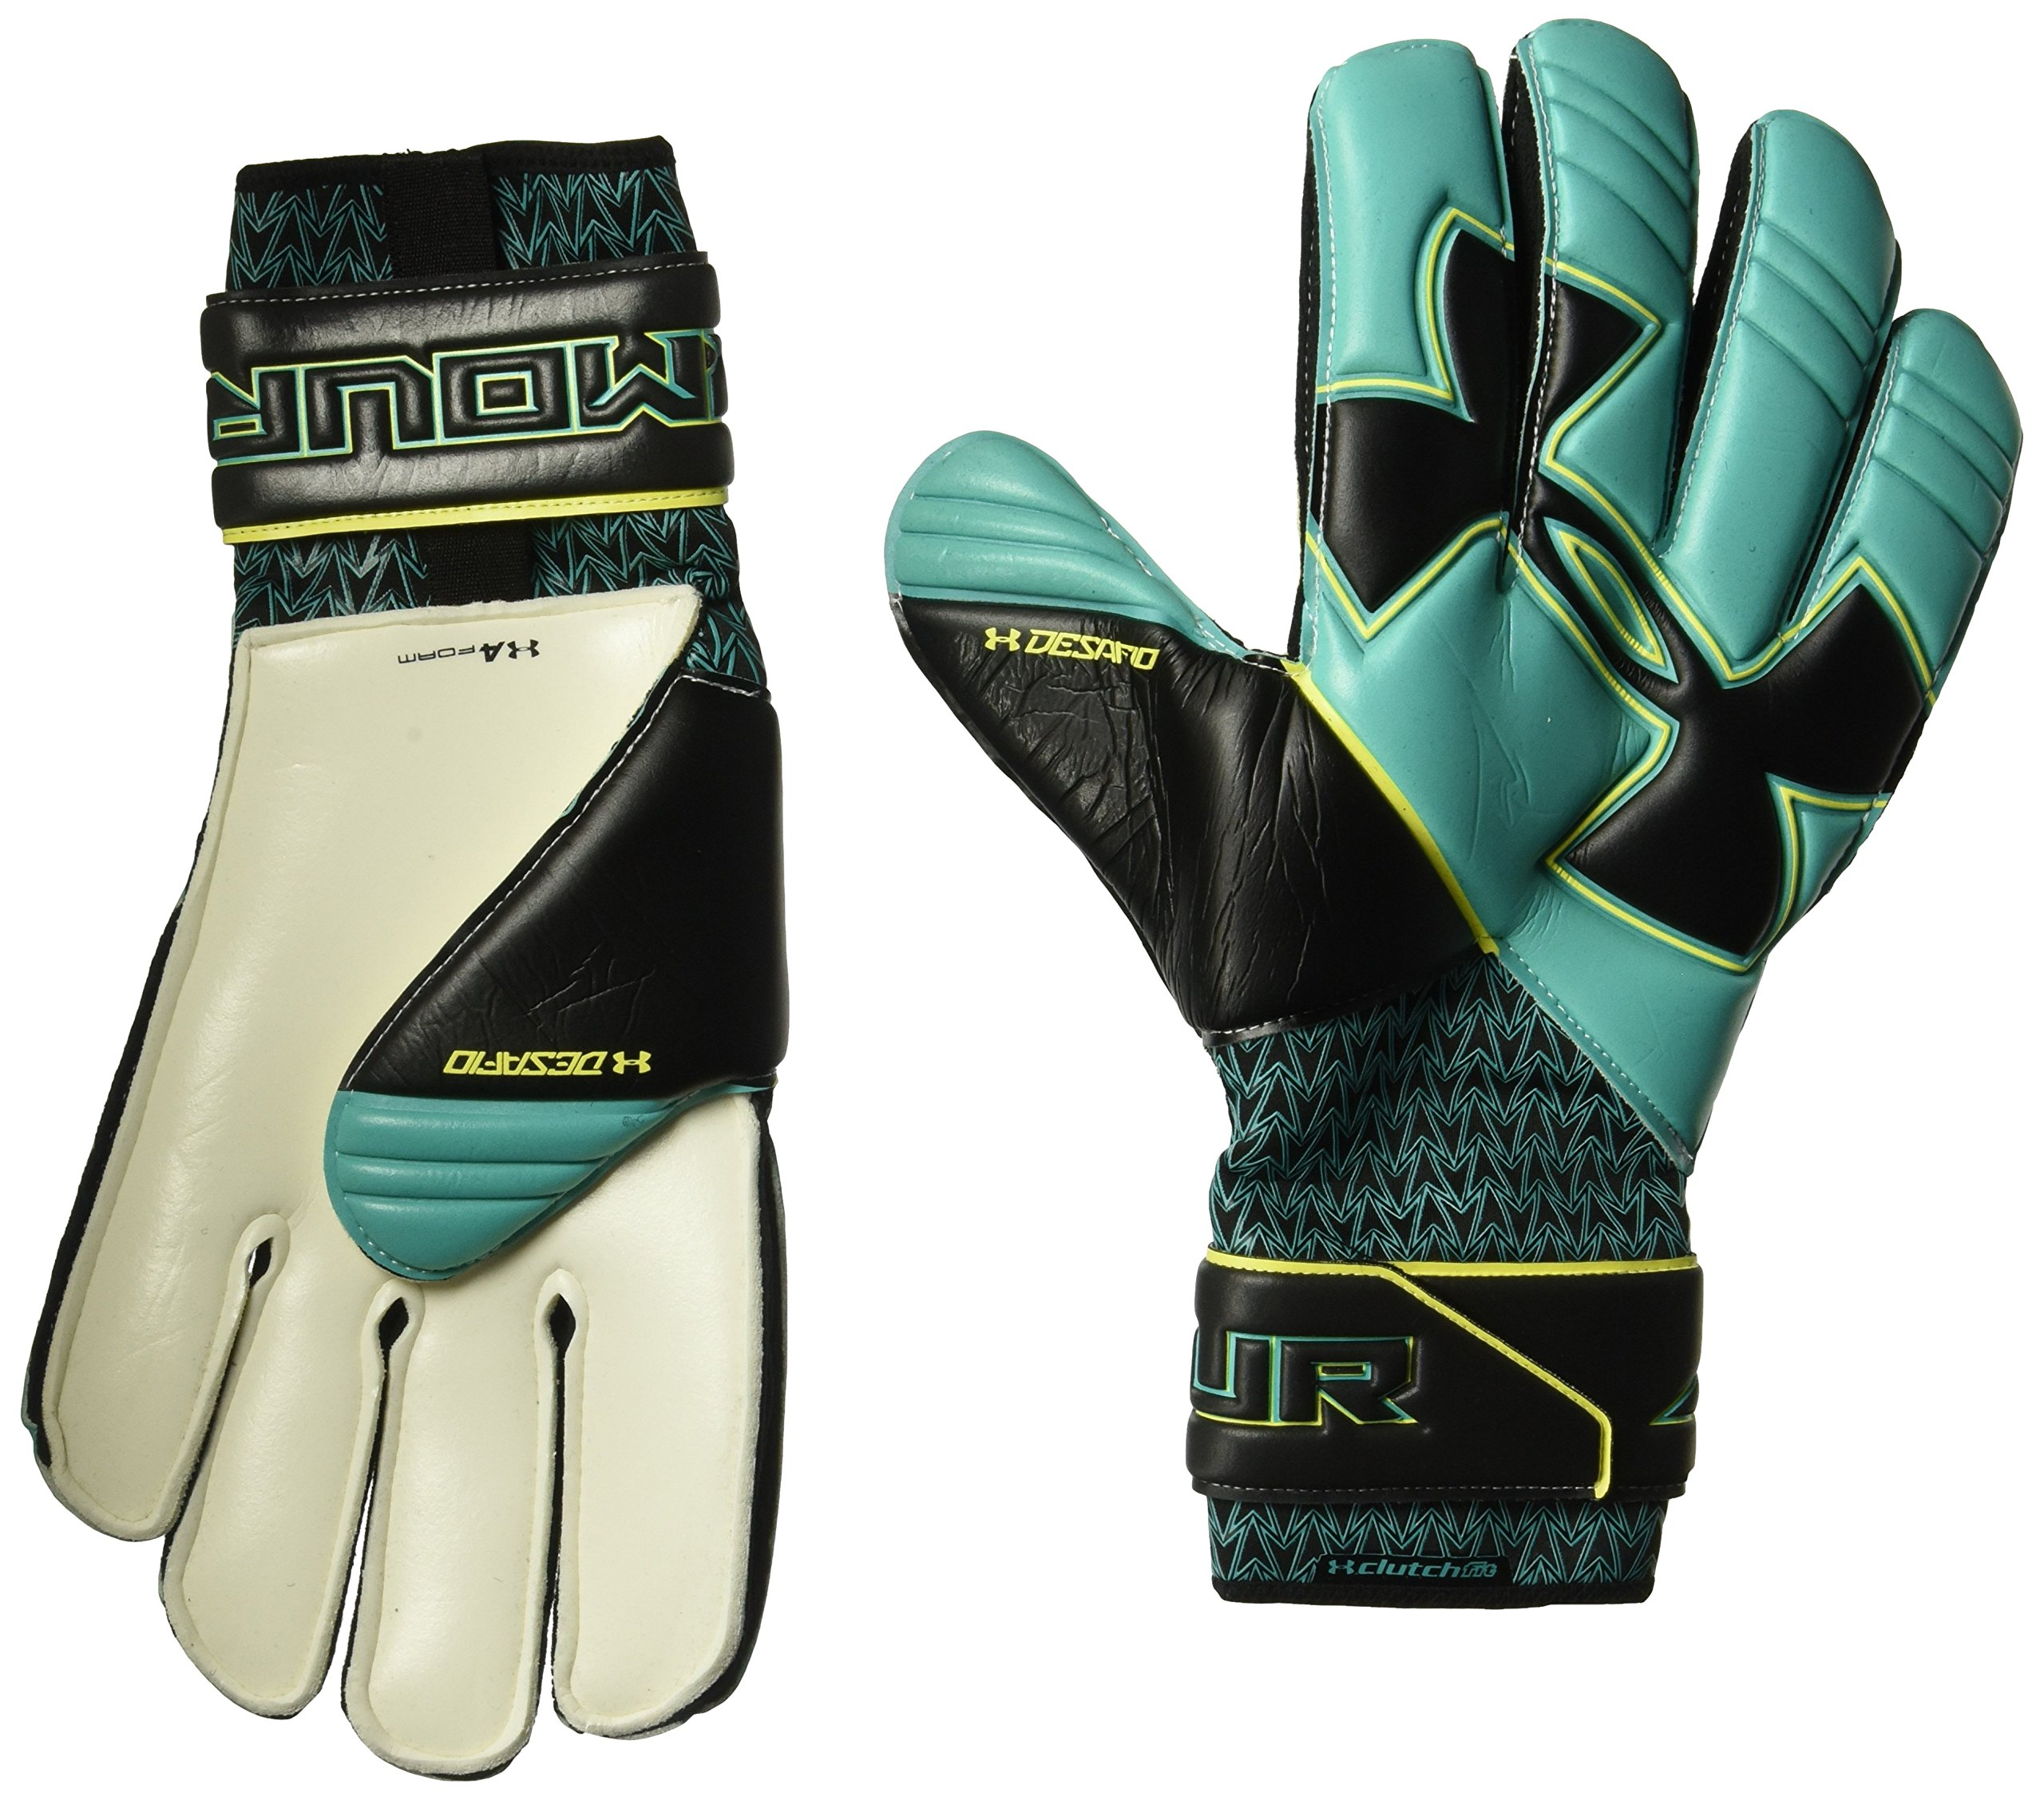 Under Armour Men's Desafio Pro Soccer Gloves, Teal Punch (594)/Black, 10